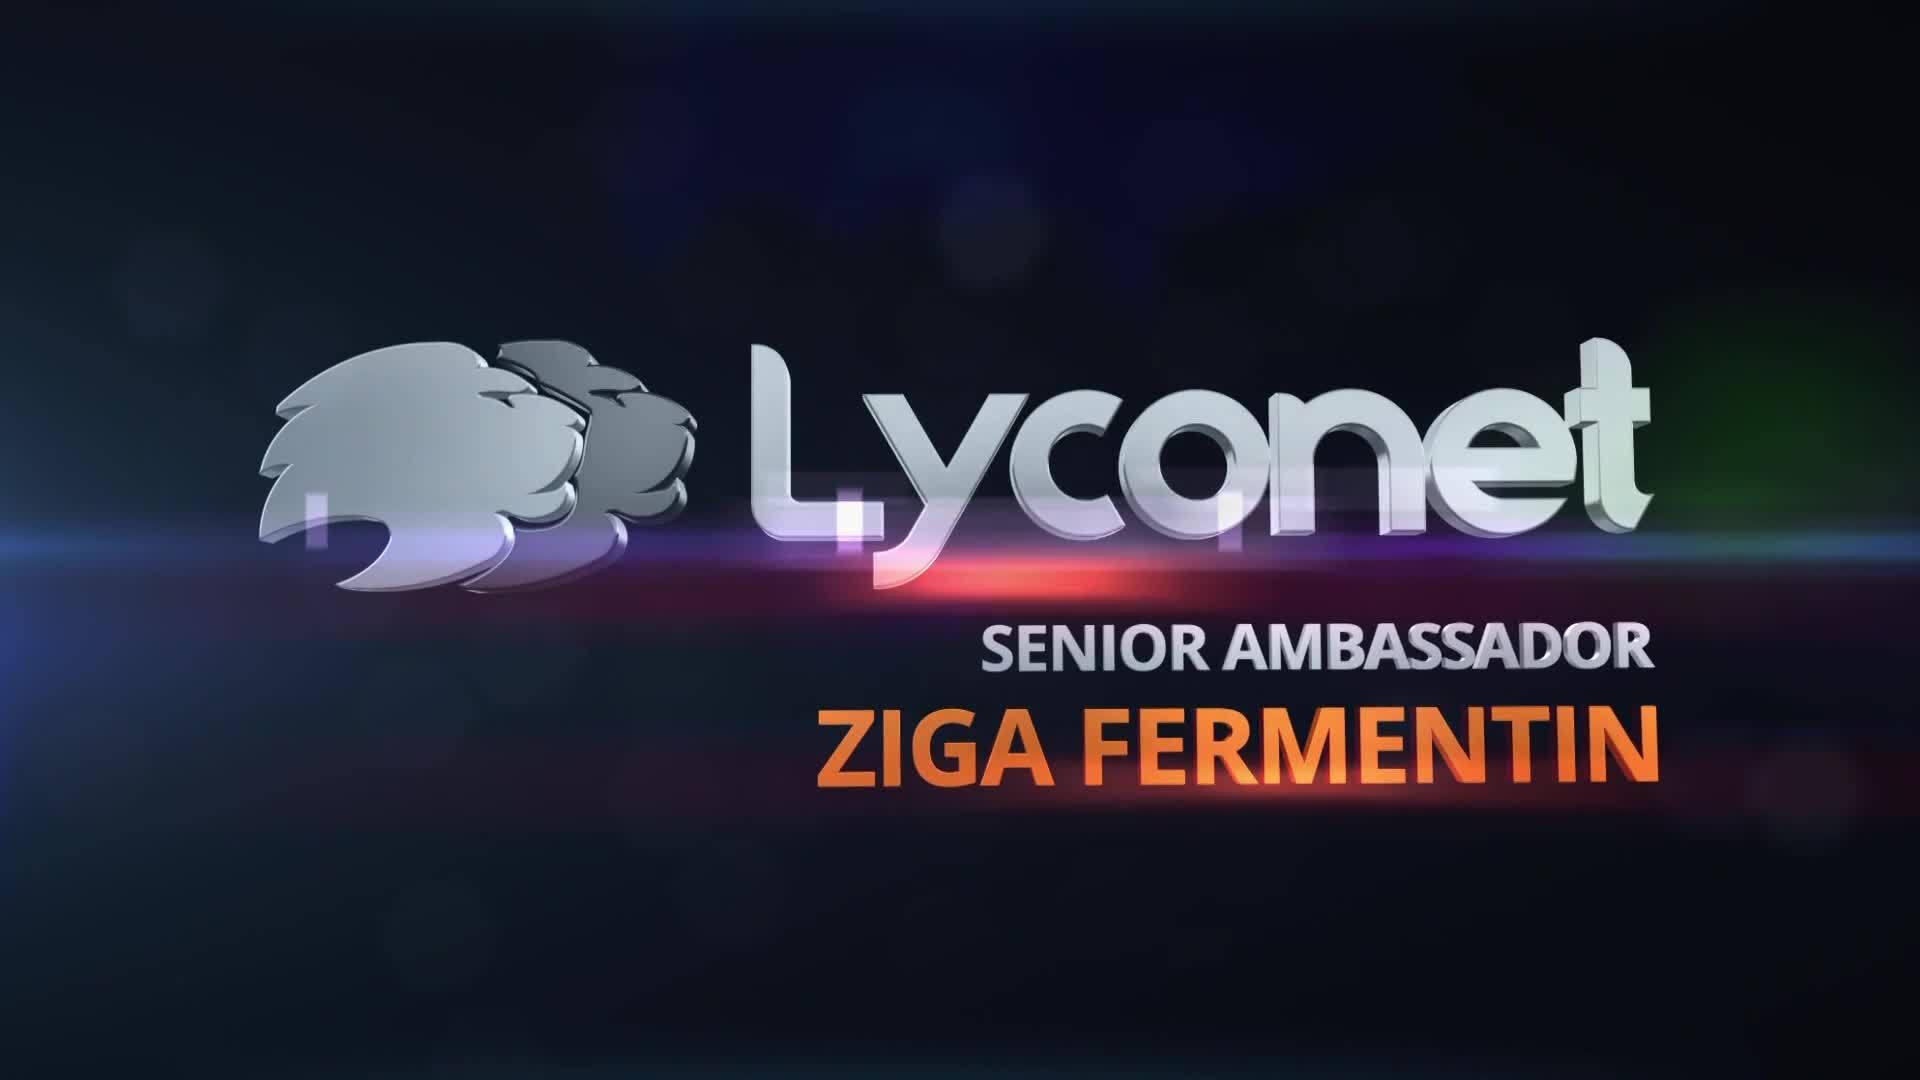 Senior Ambassador - Ziga Fermentin